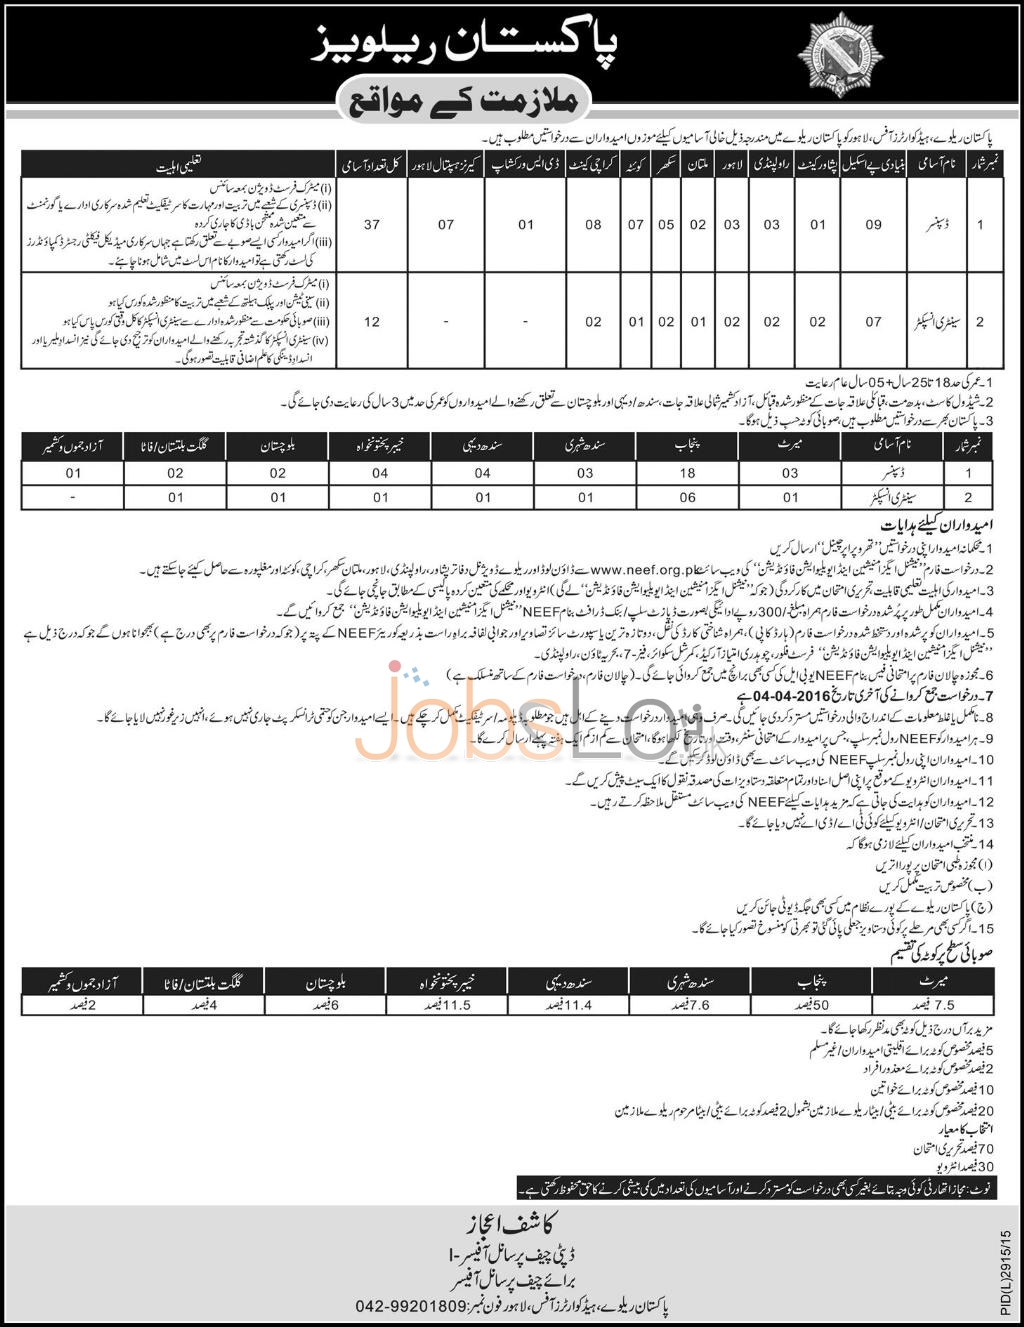 Pakistan Railways HQ's Office Lahore 2016 Jobs Application